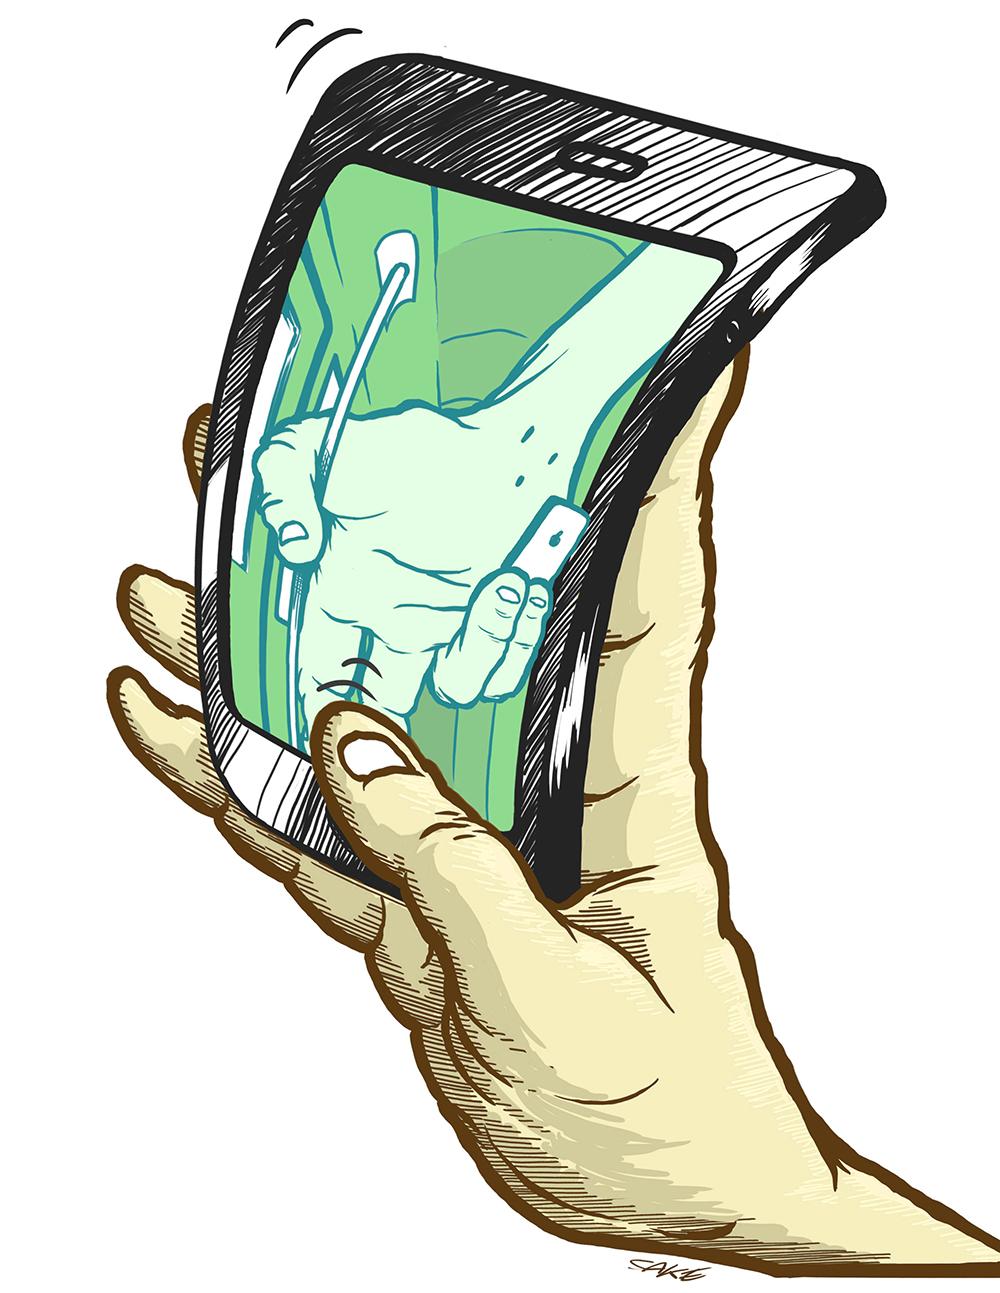 Tracking, Smartphone